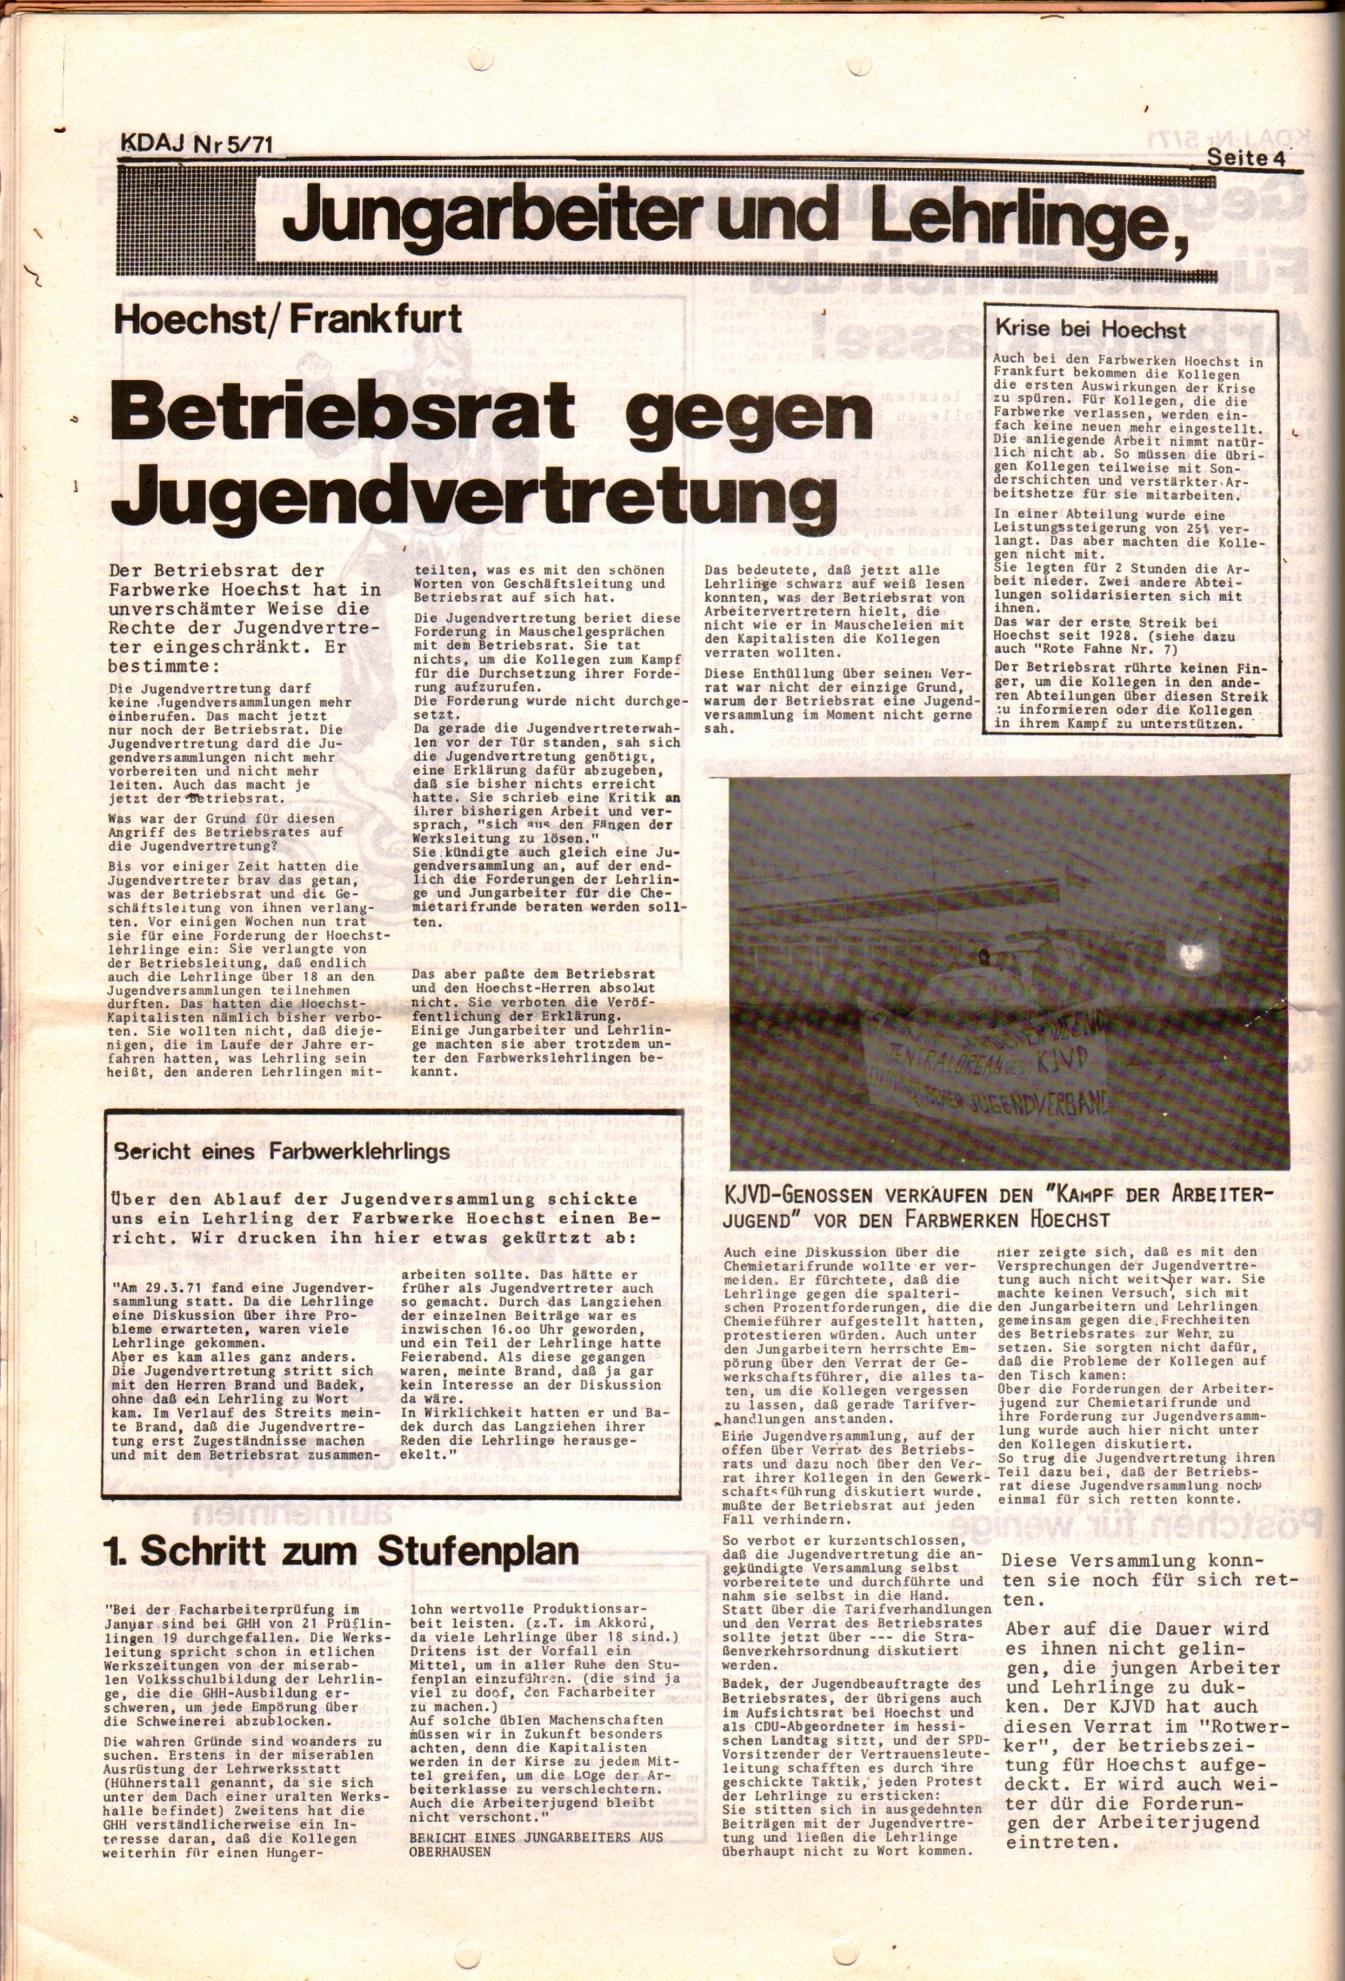 KDAJ, 2. Jg., Mai 1971, Nr. 5, Seite 4